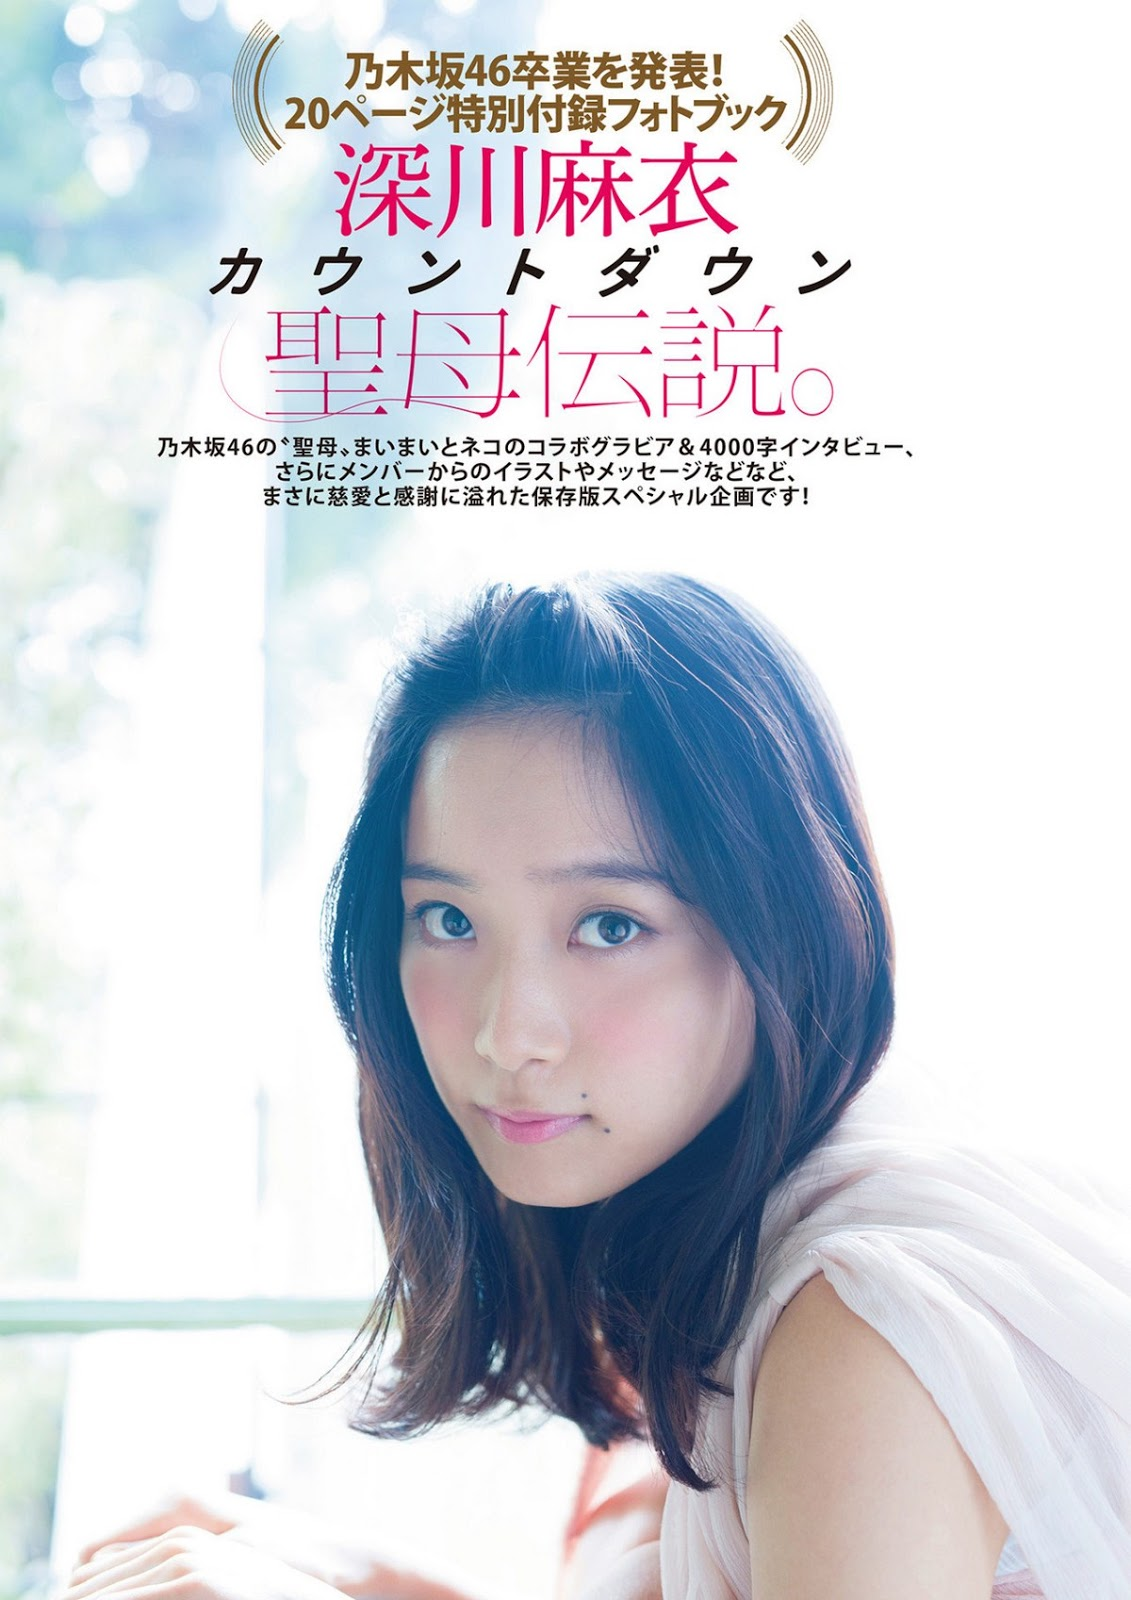 Fukagawa Mai 深川麻衣 Nogizaka46, FLASH Special Gravure Best 2016.03.30 No.22